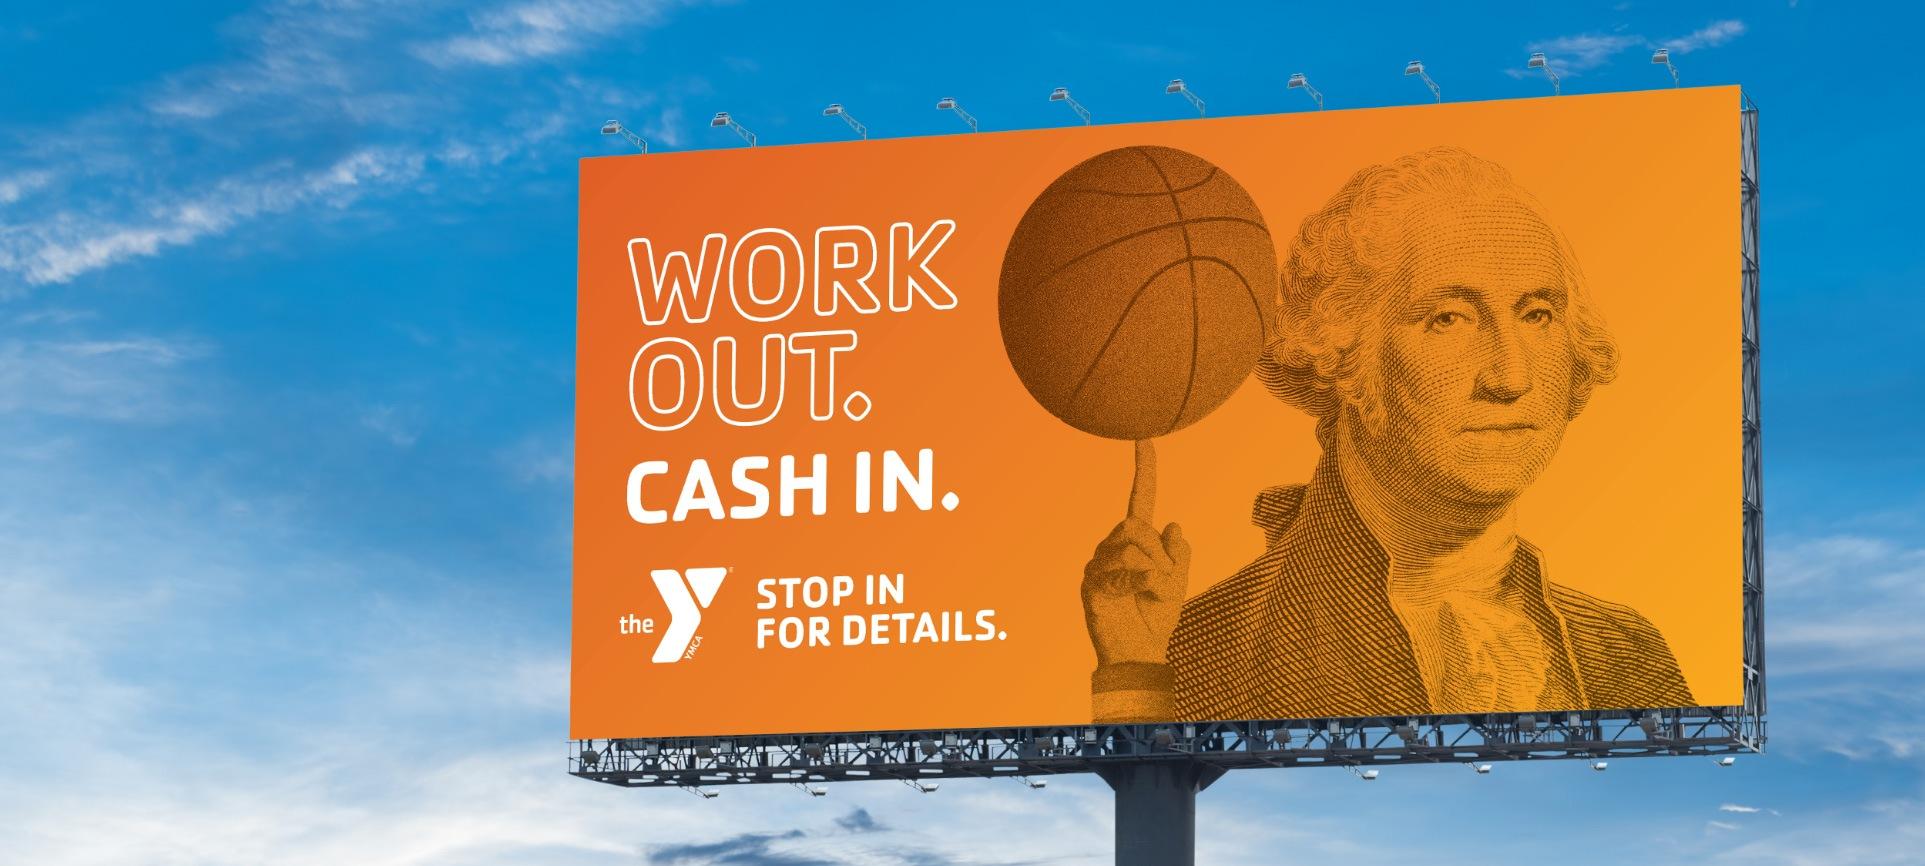 Work Out Cash In Billboard